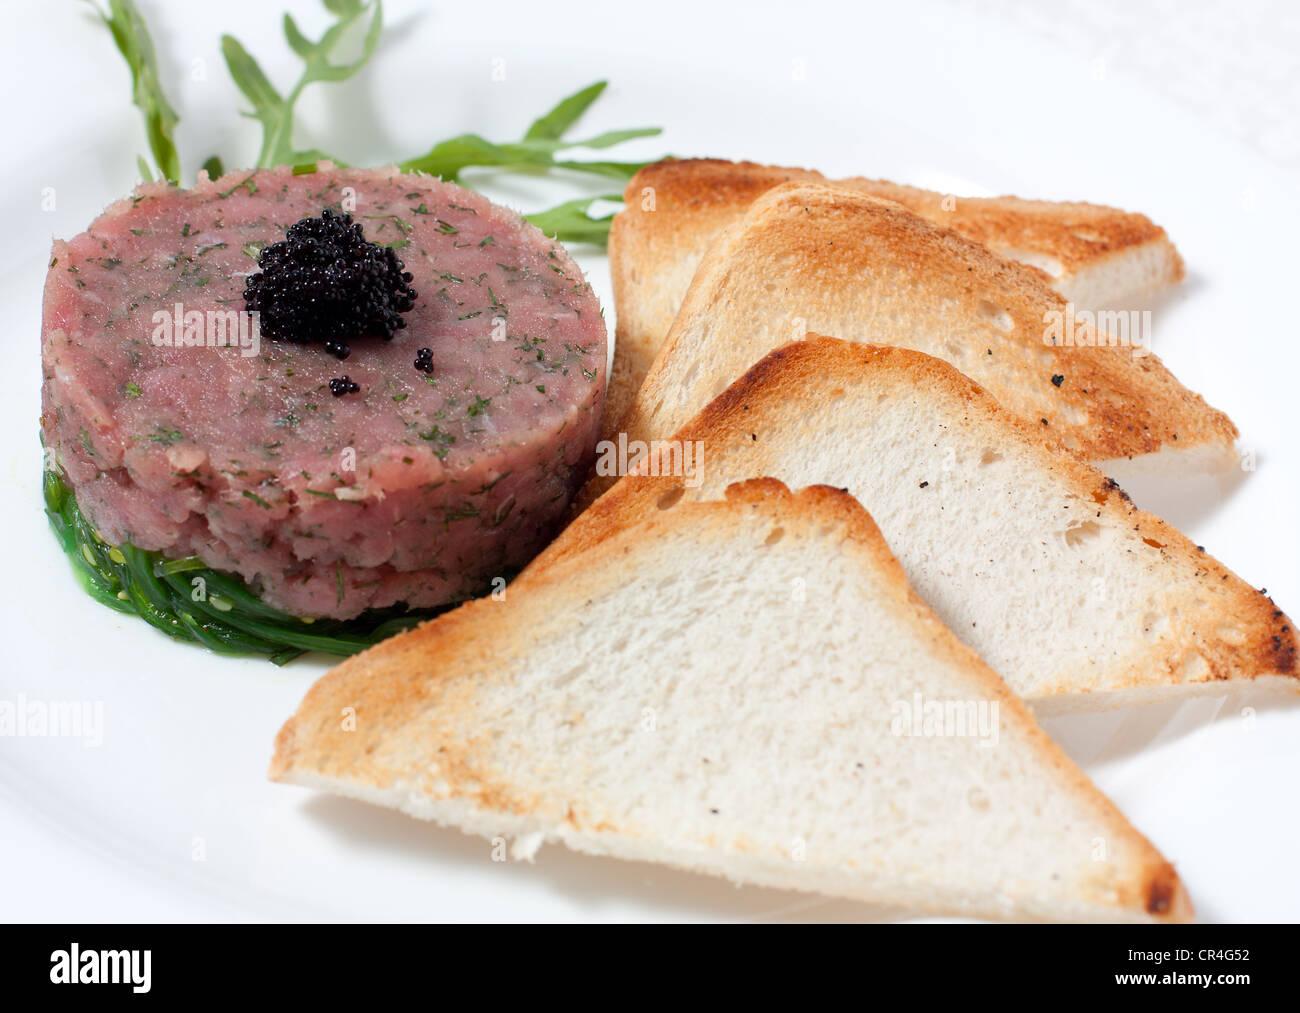 Croutons and a salad with salmon, seaweed and caviar - Stock Image